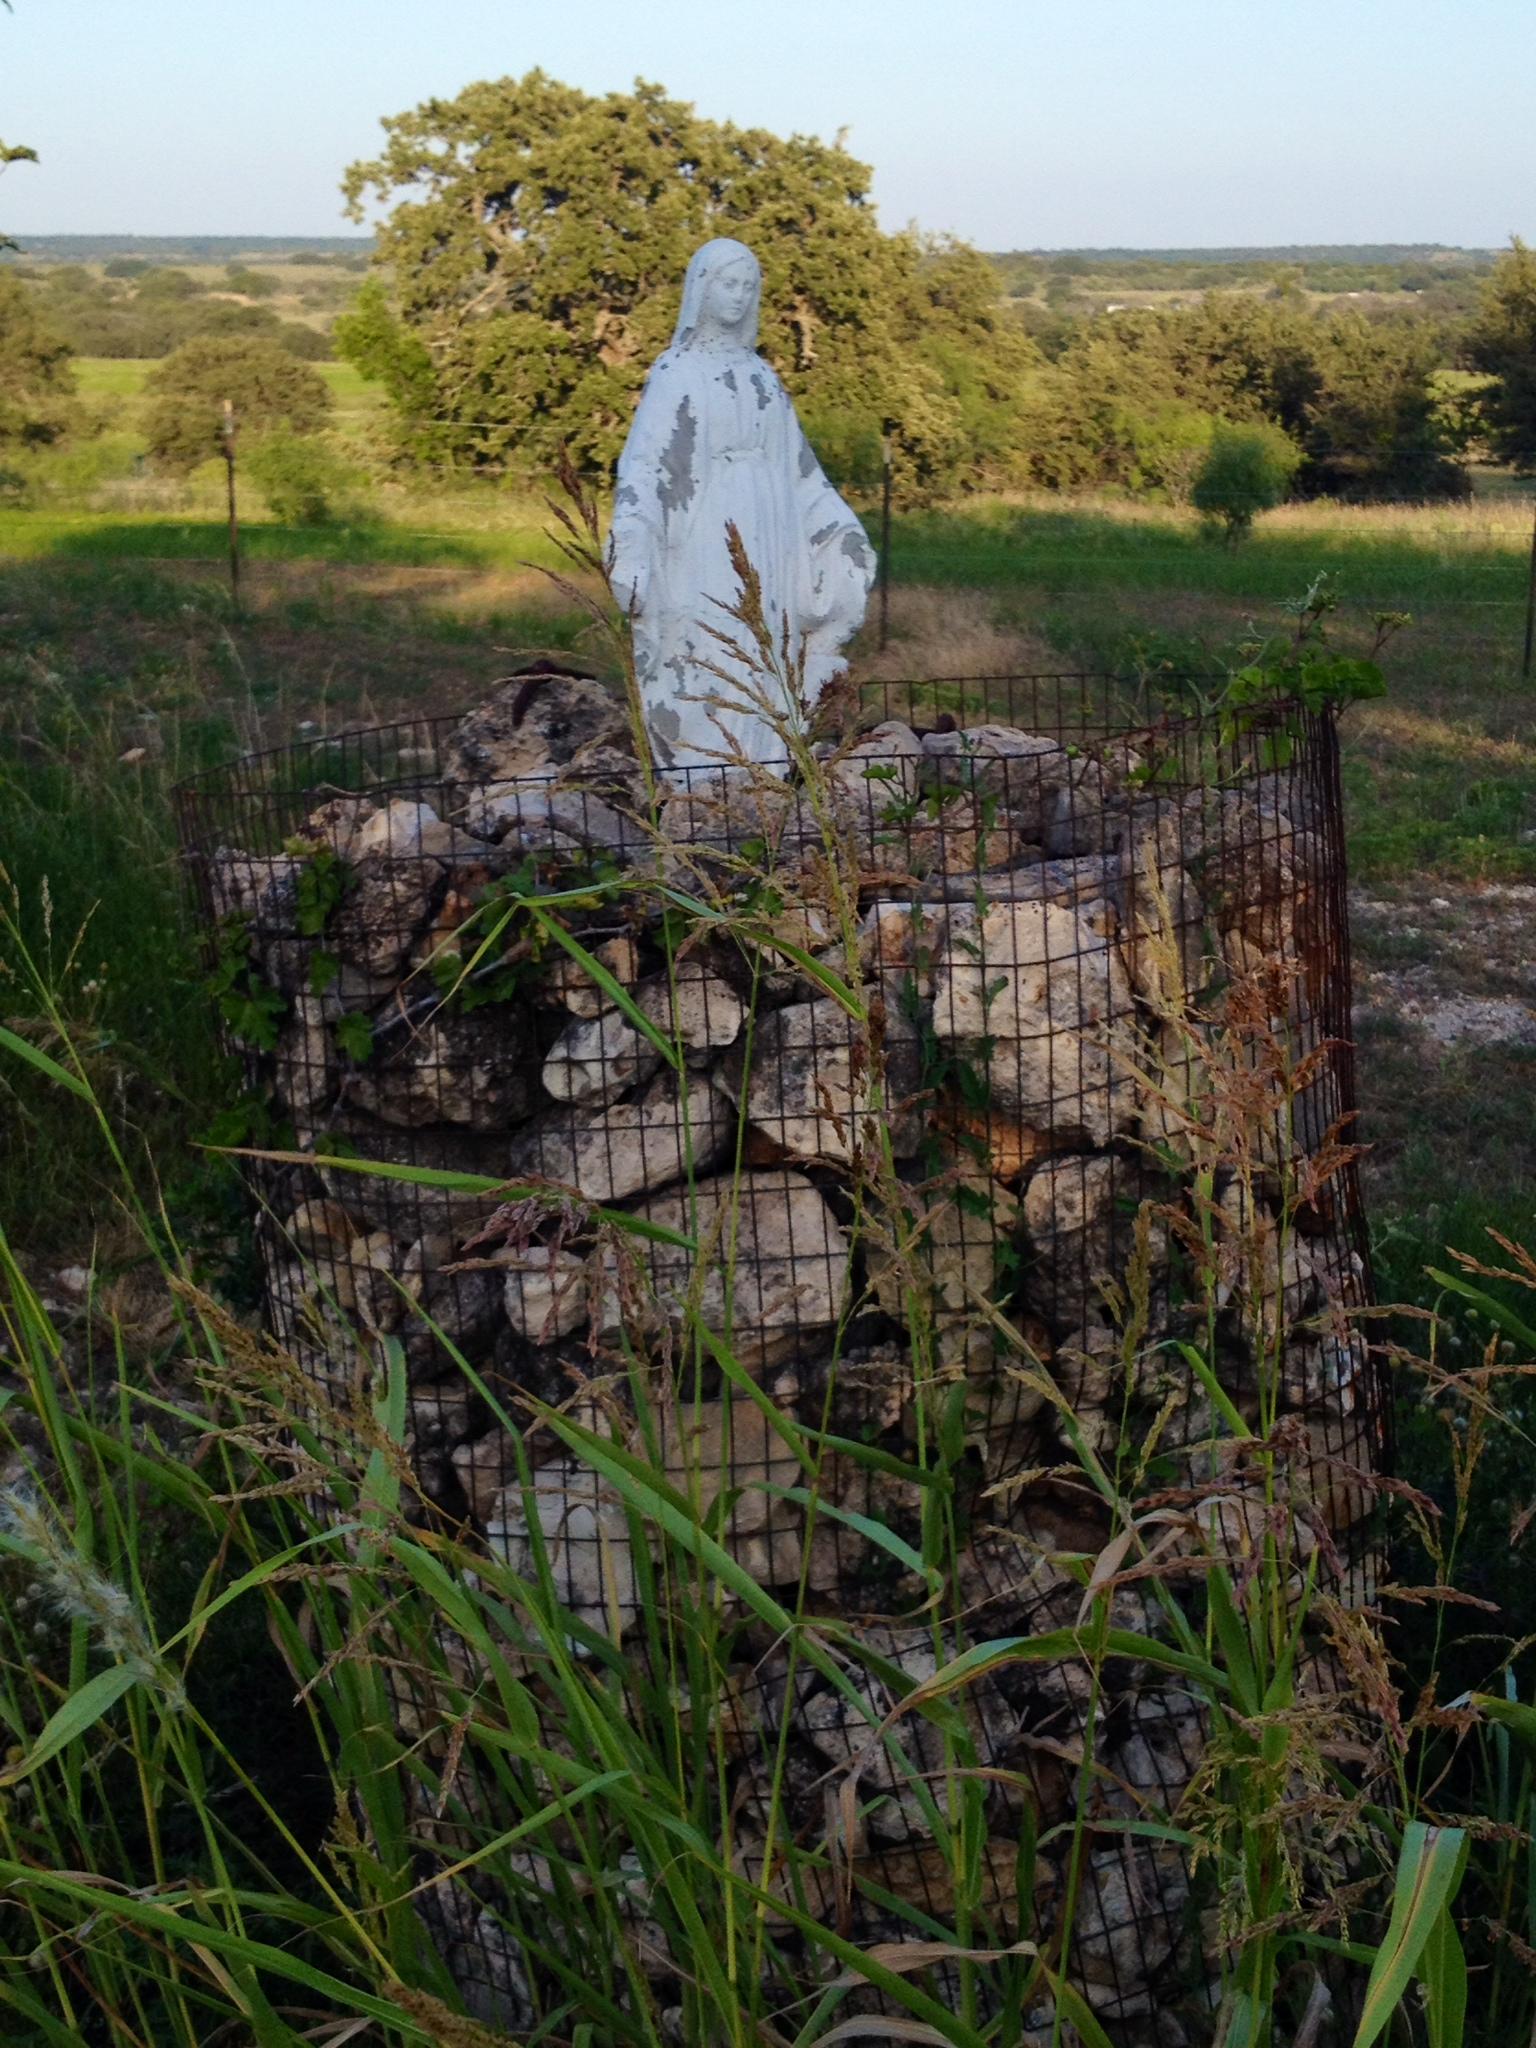 A faded Mary statue still overlooks the horizon